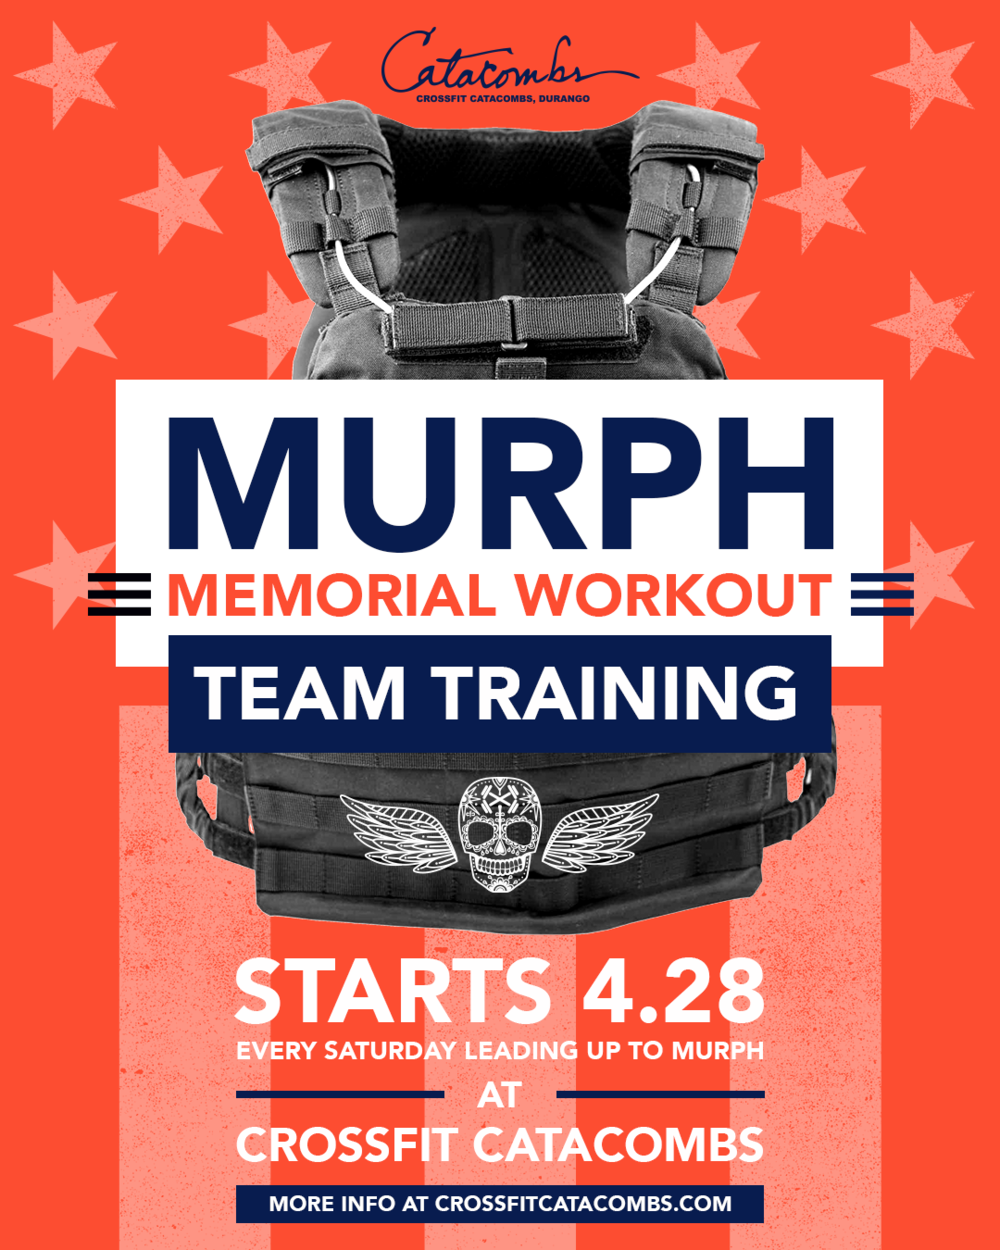 1071_CFC_Murph_team_IGpost_v1.png